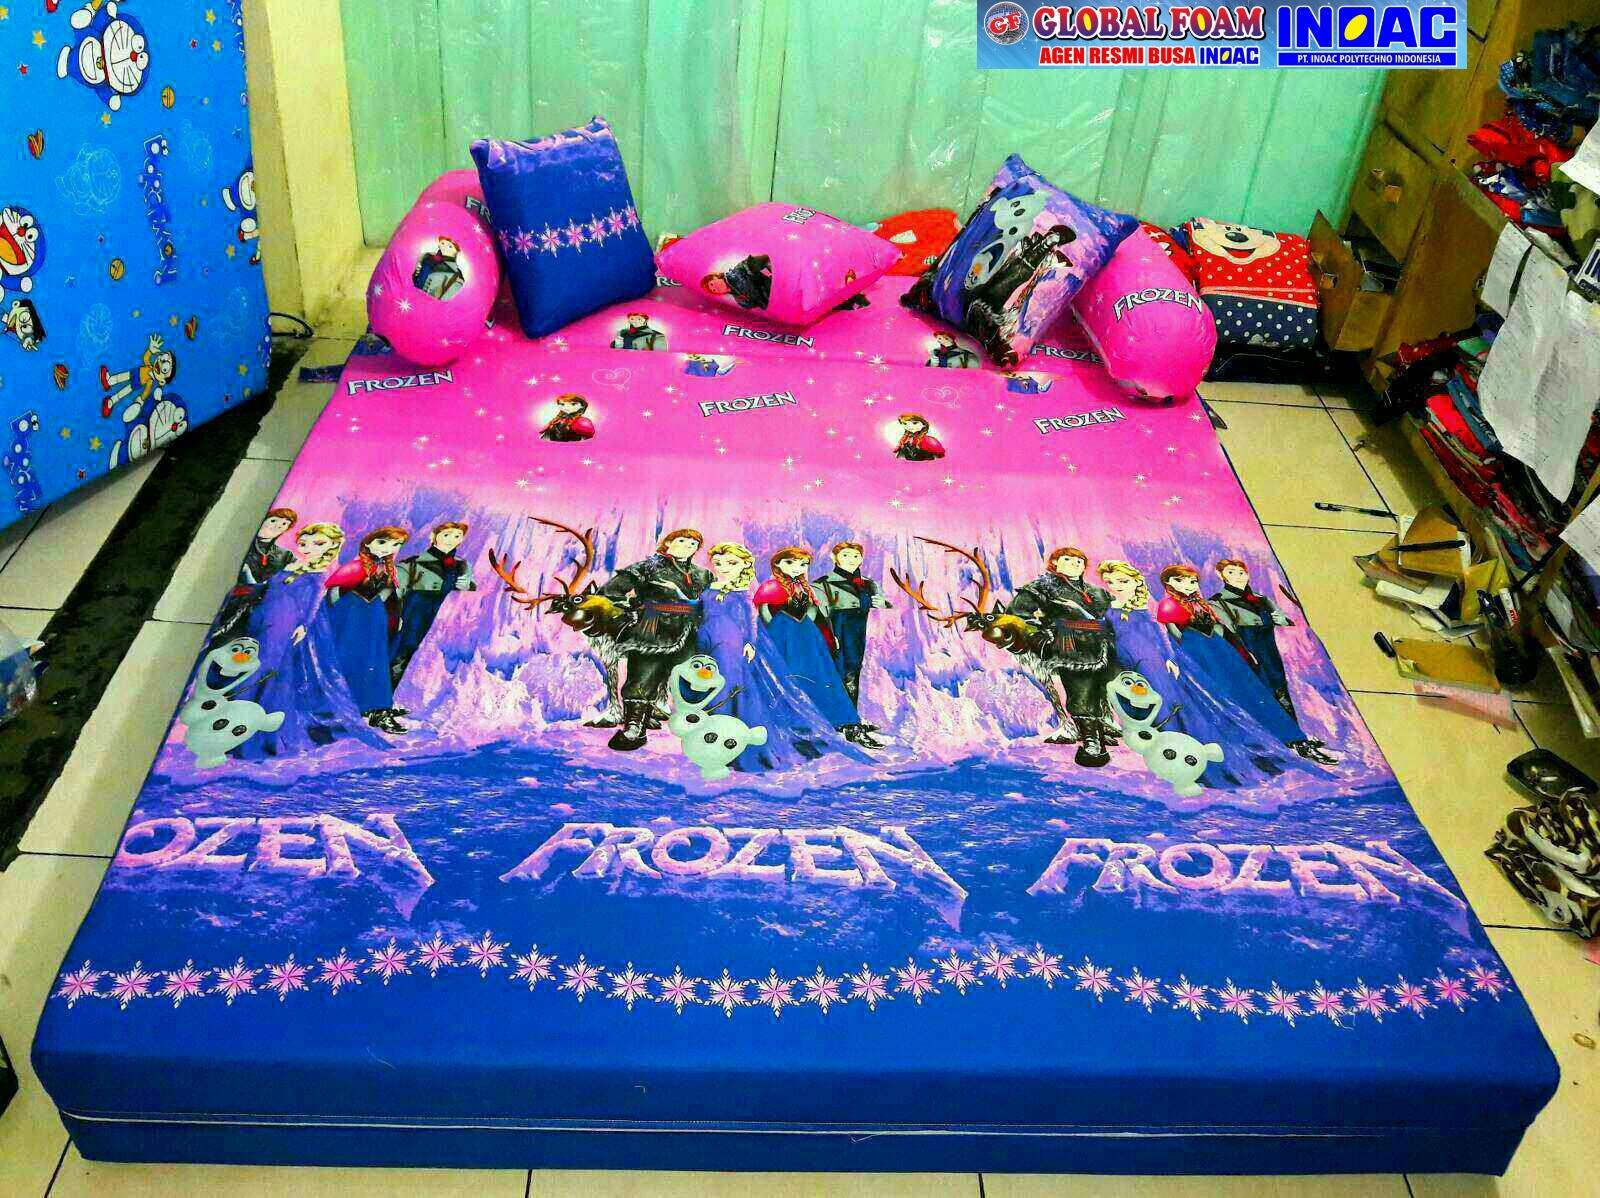 Harga Sofa Bed Inoac No 1 Cream Colored Leather Reviews Kasur 2018 Distributor Busa Asli Global